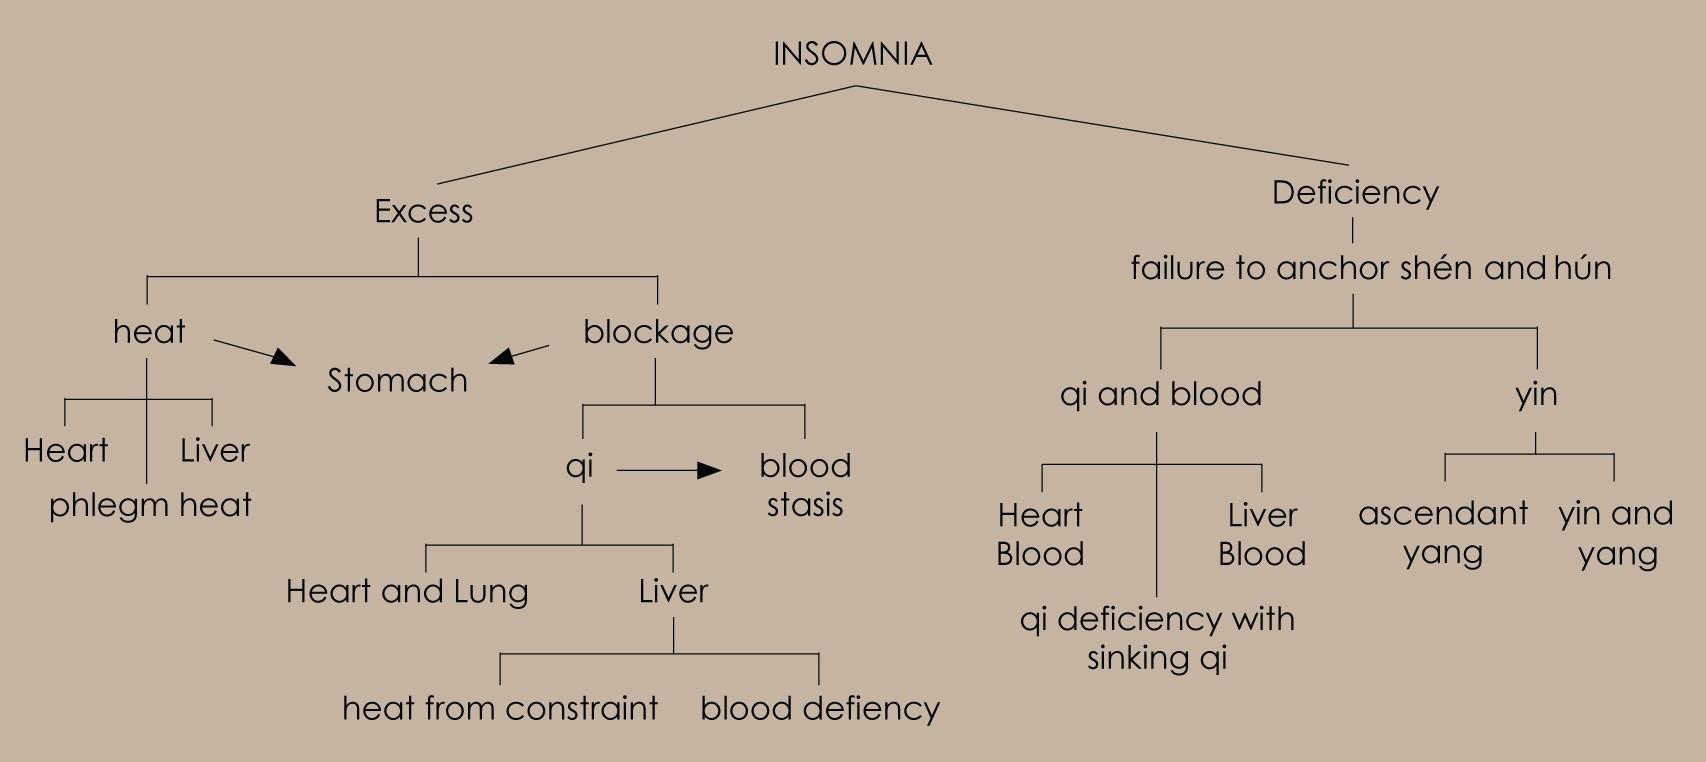 Stabilizing Shen and Hun: Insomnia